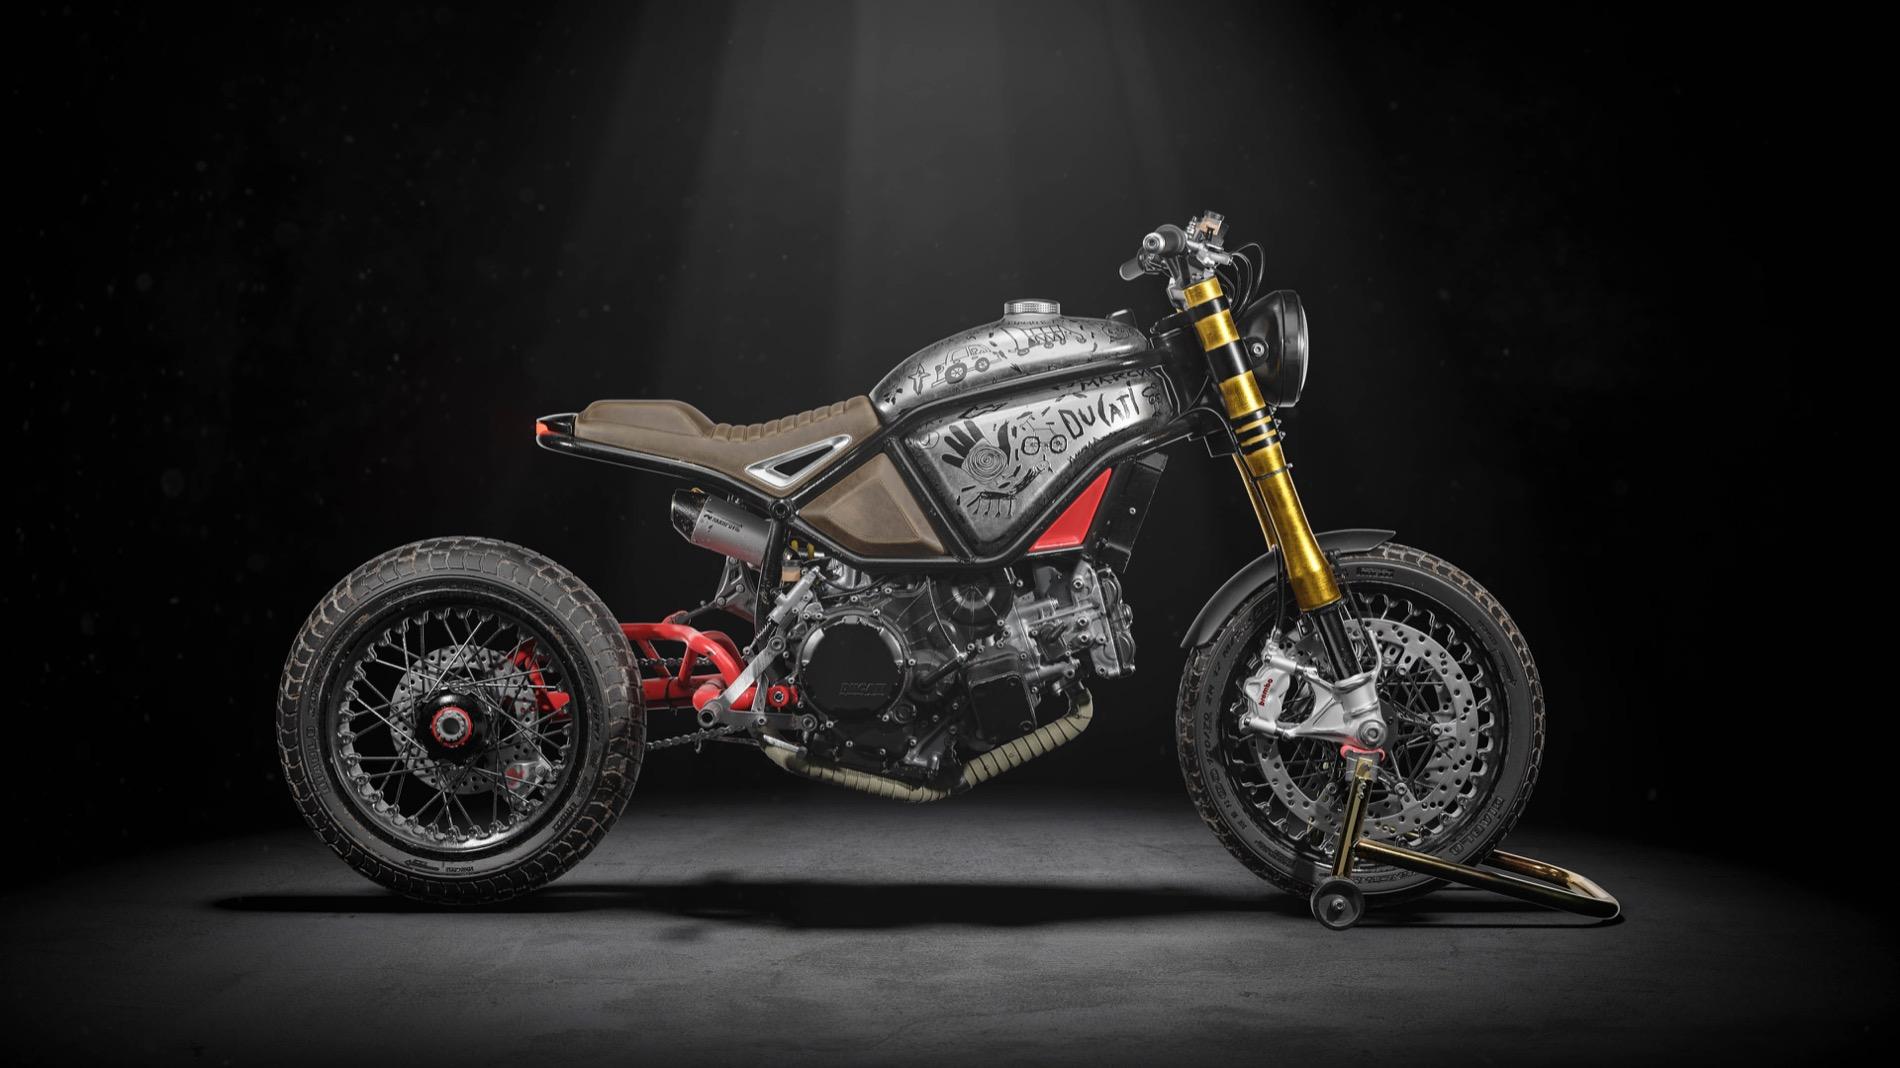 Naughty Quadro es el prototipo Mad Max sobre la Ducati 1299 Panigale